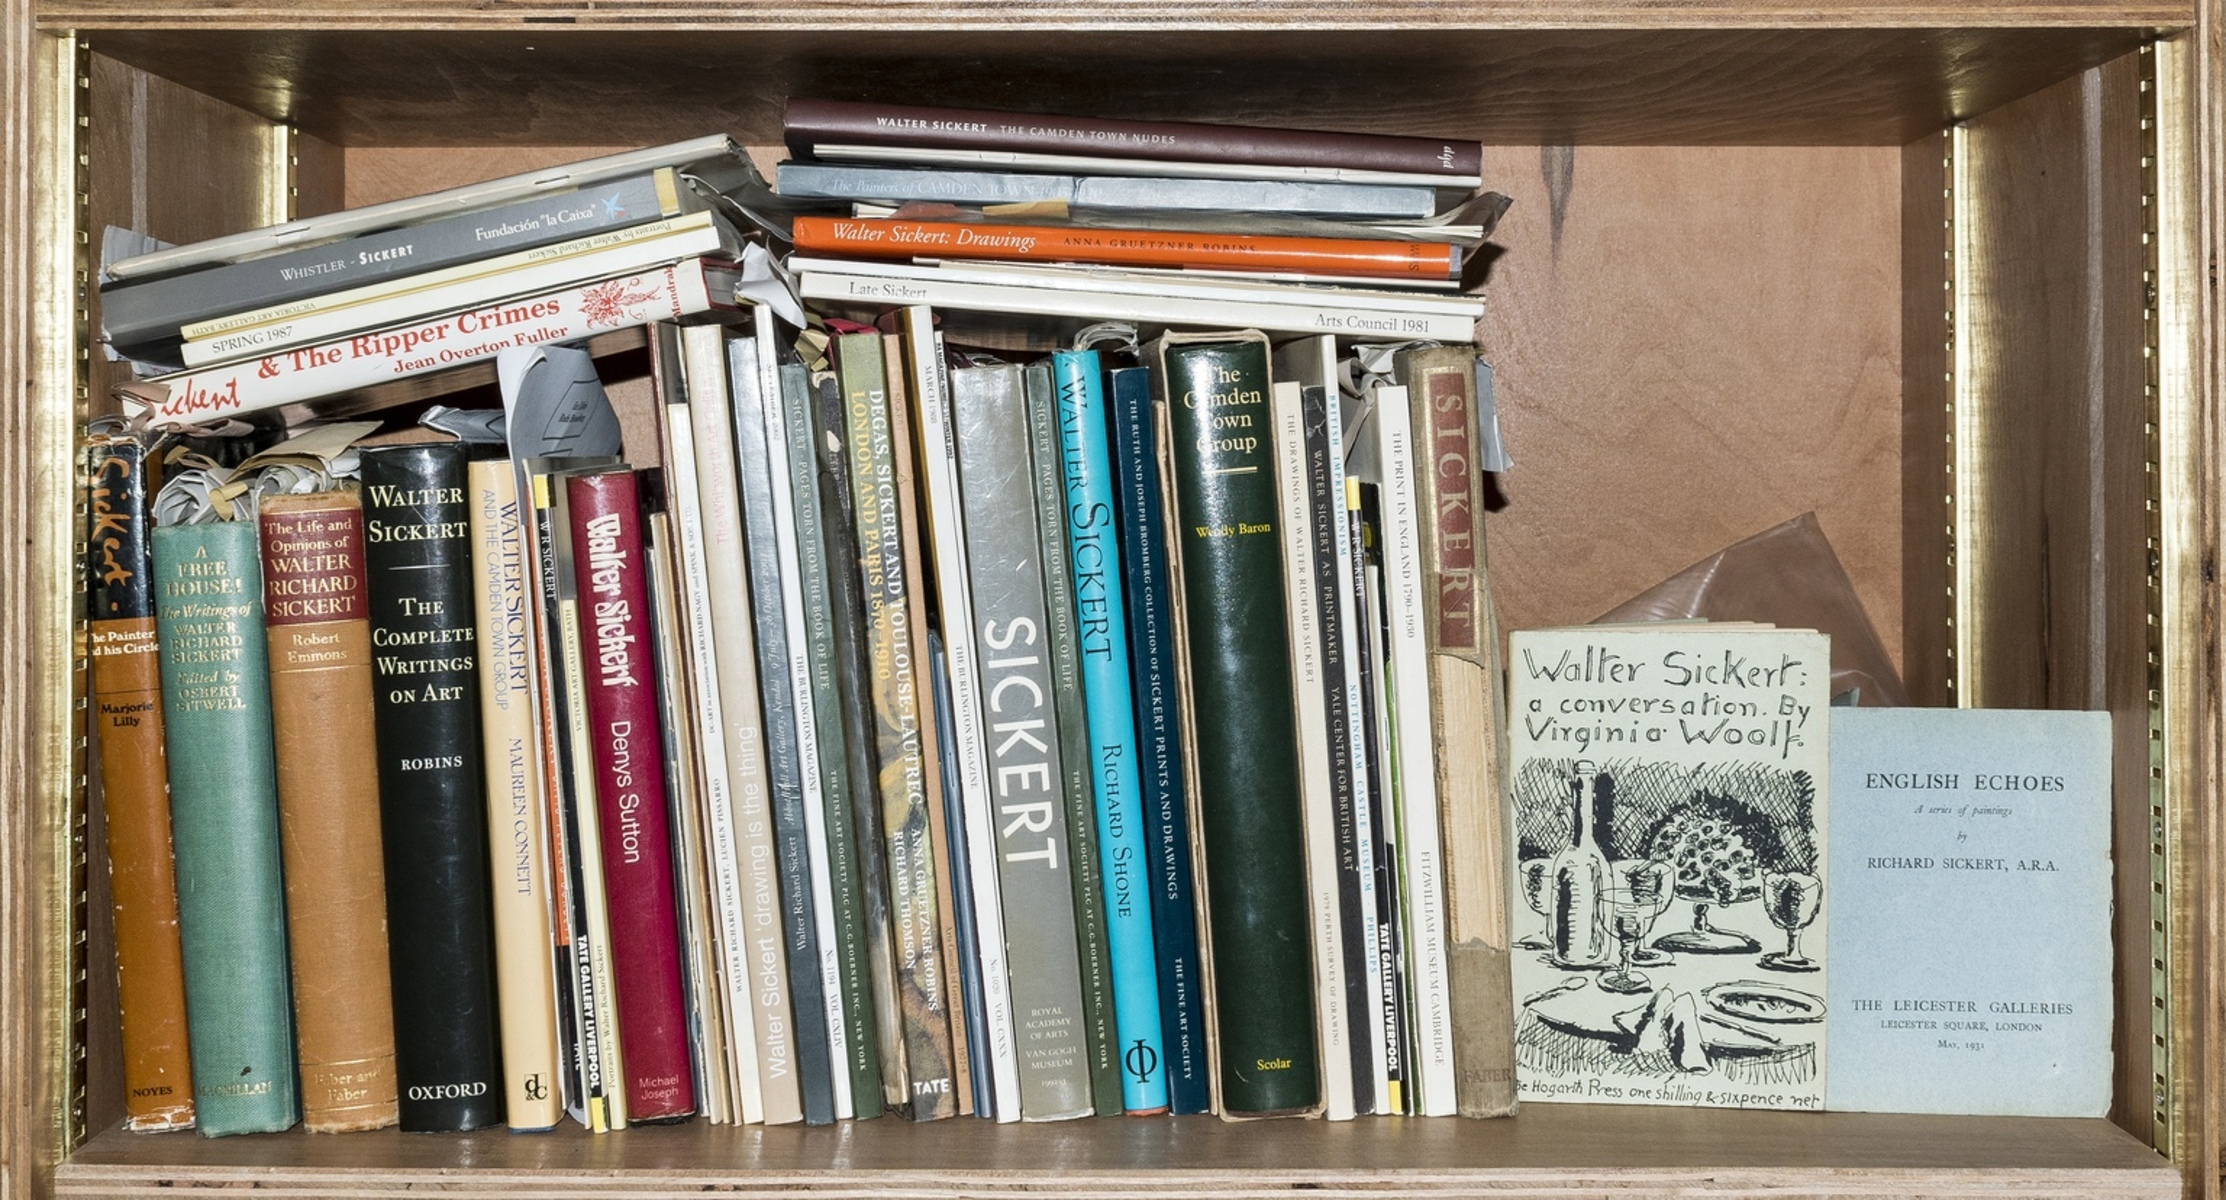 Sickert (Walter).- Woolf (Virginia) Walter Sickert: a Conversation, first edition, original …